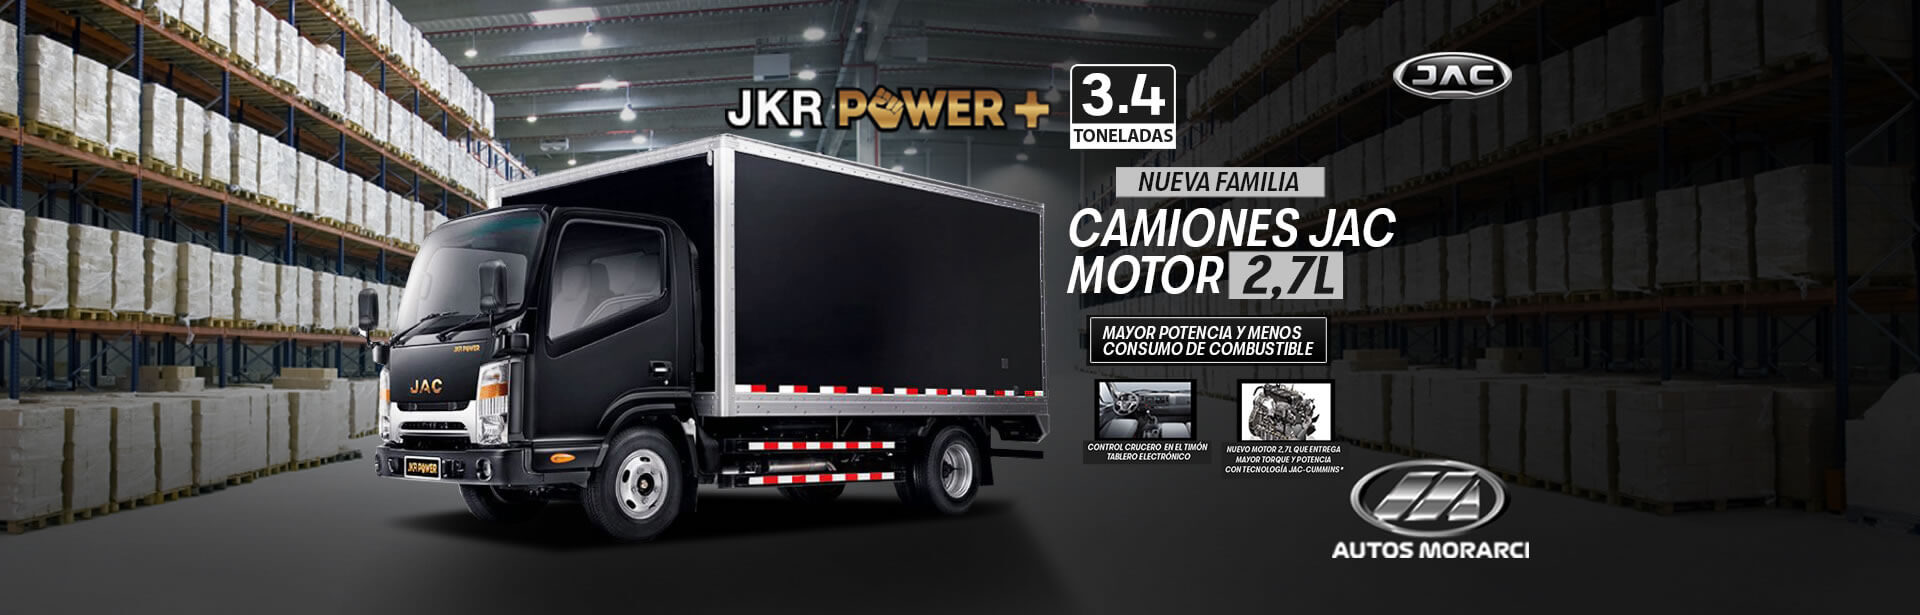 JKR Medio Power +